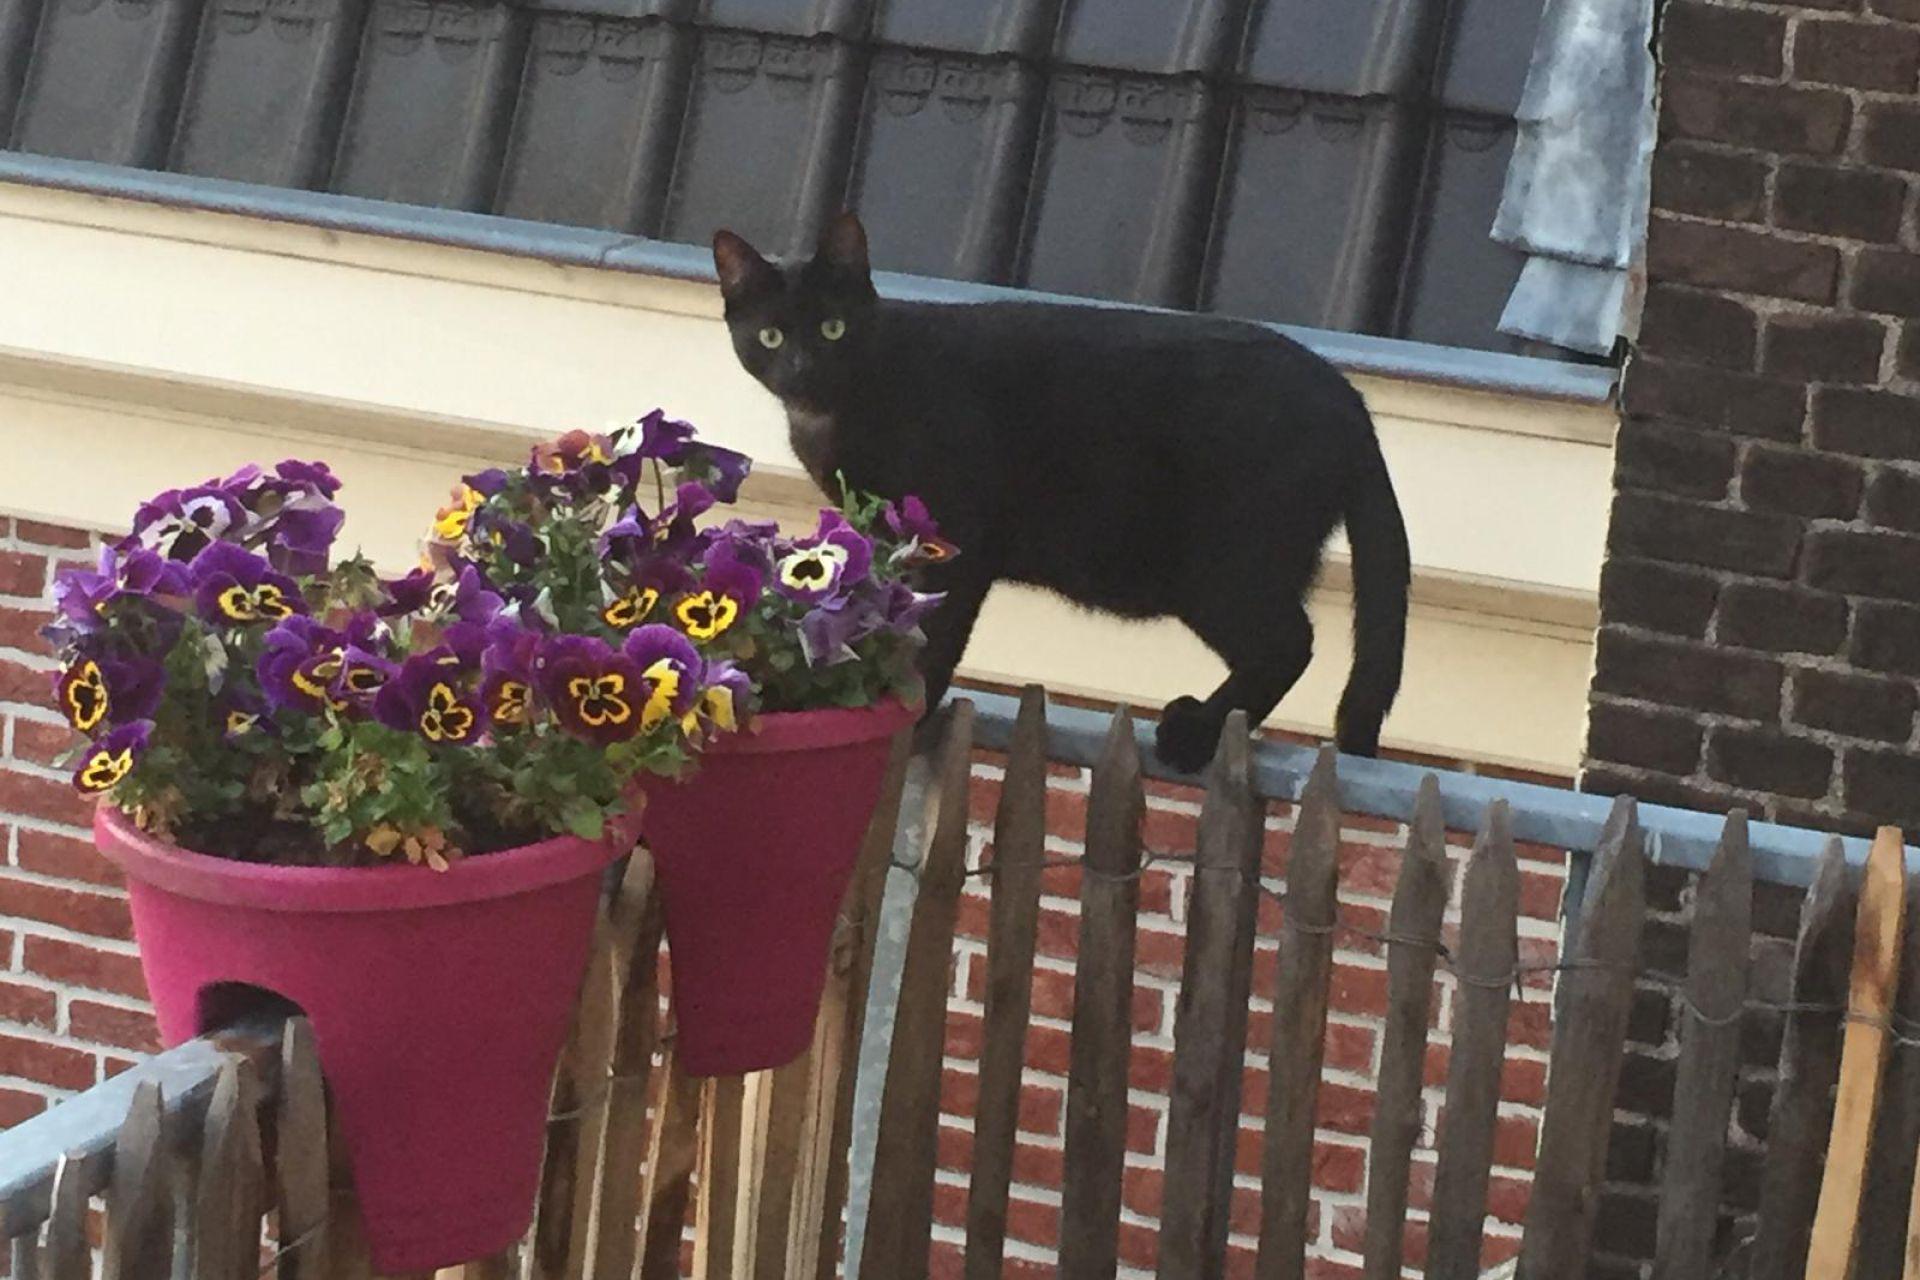 Dexter op het balkon, mei 2020